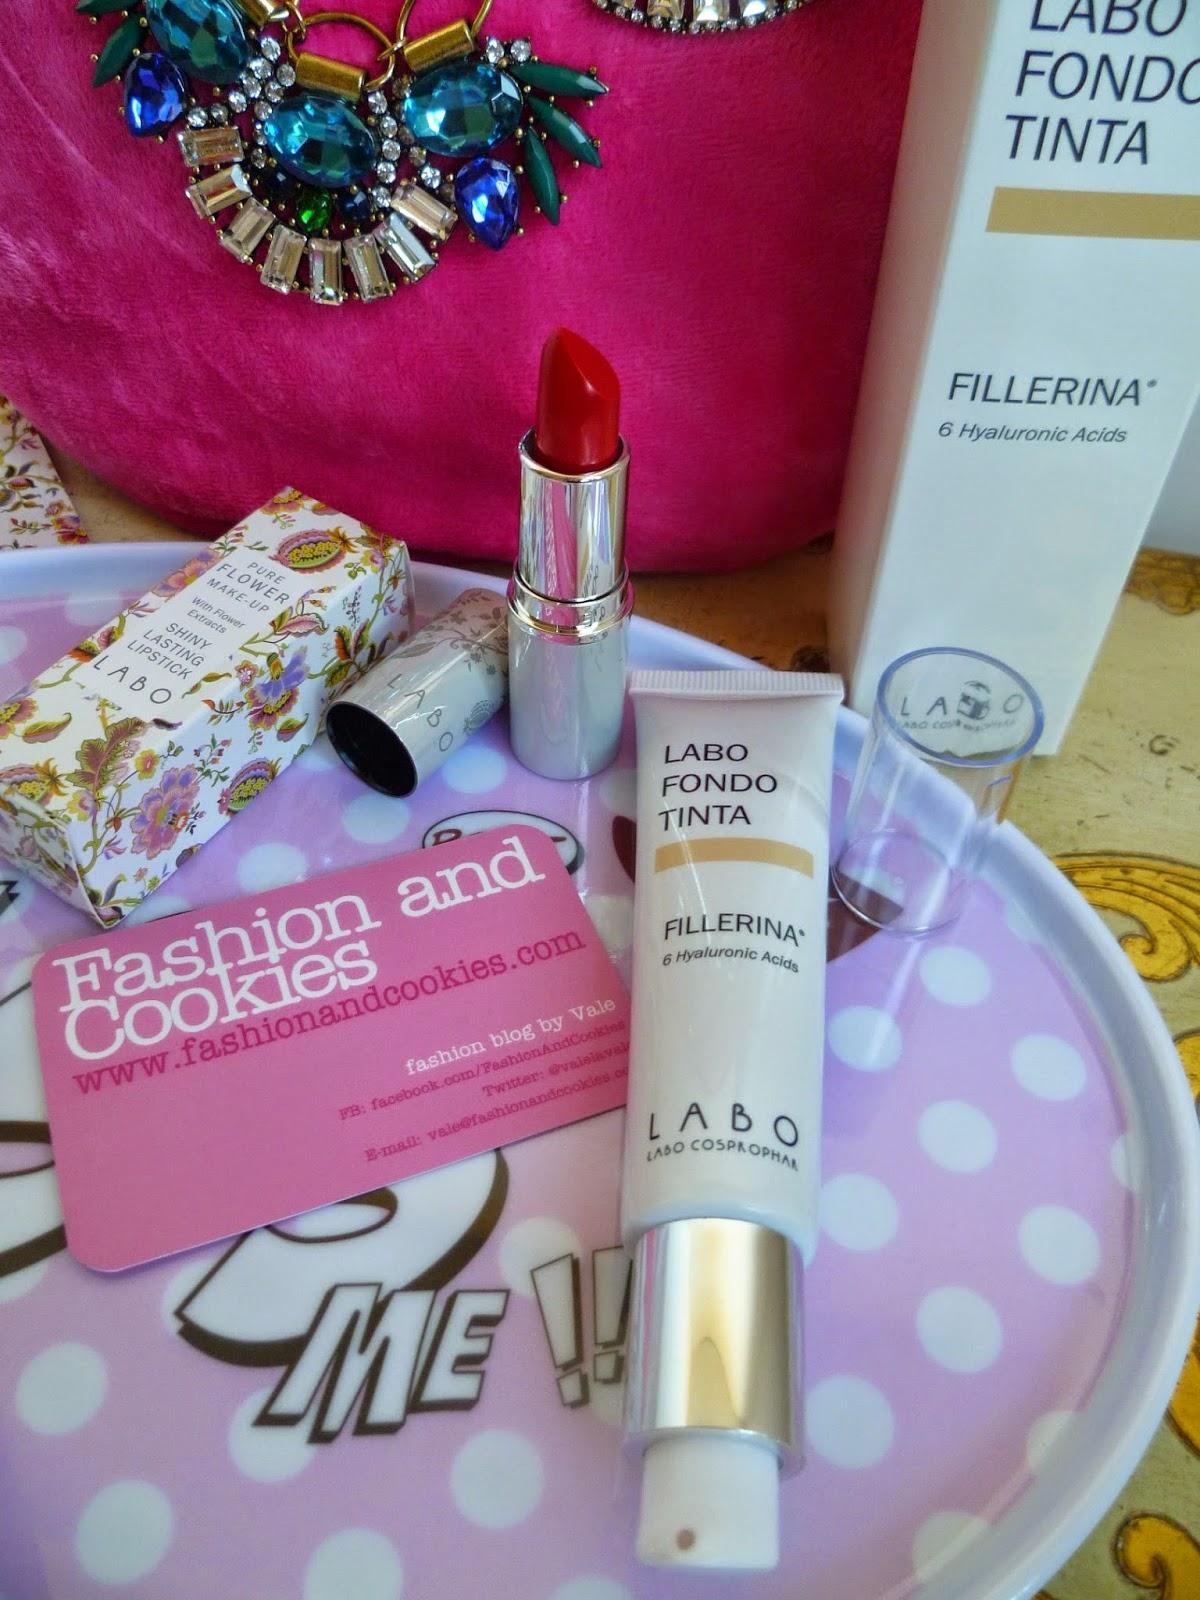 Labo make-up, Labo fillerina, Labo fillerina fondotinta, Fashion and Cookies, fashion blogger, fillerina review